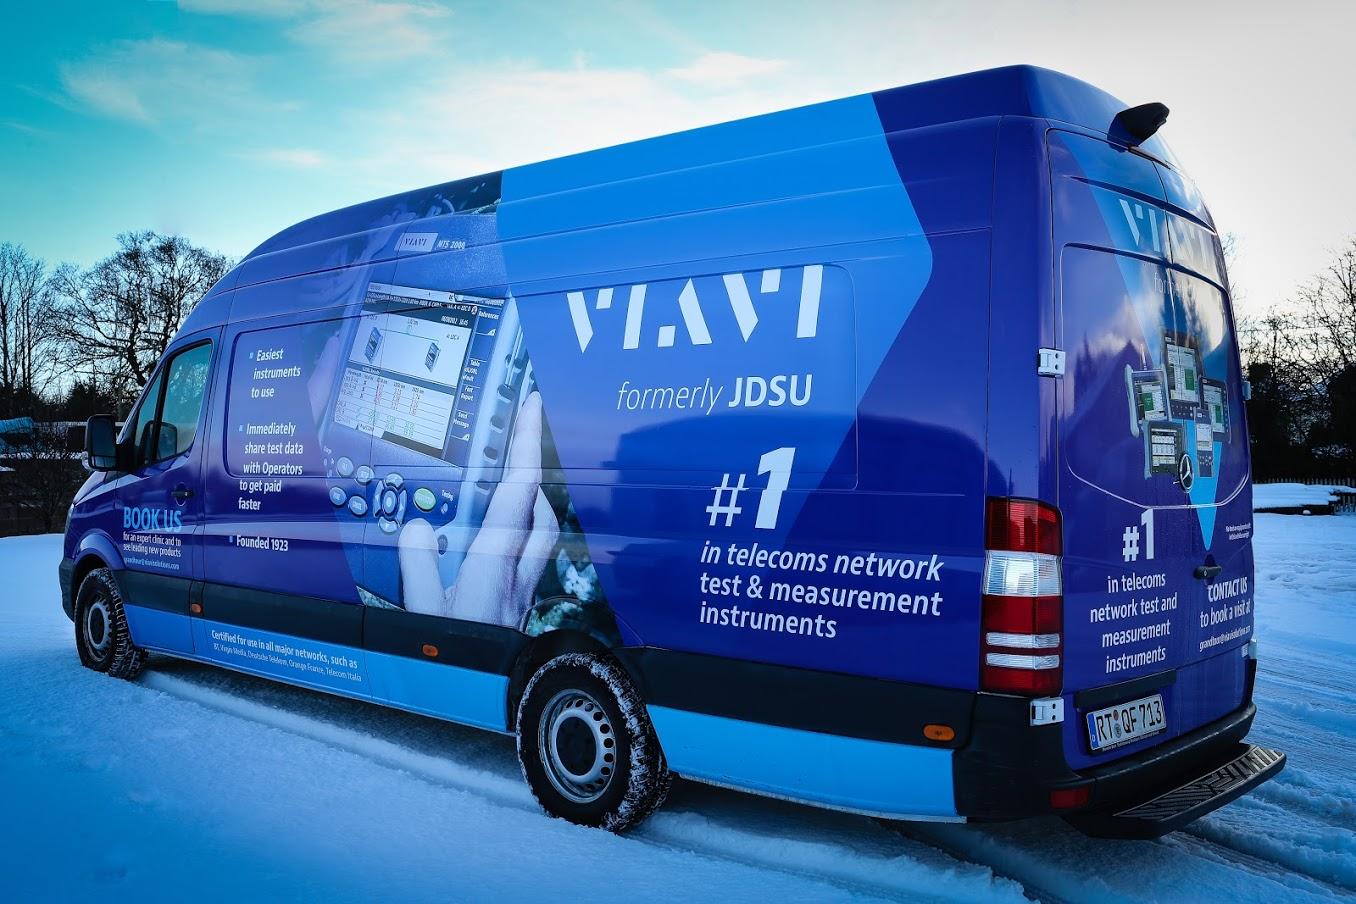 VIAVI Grand Tour Van